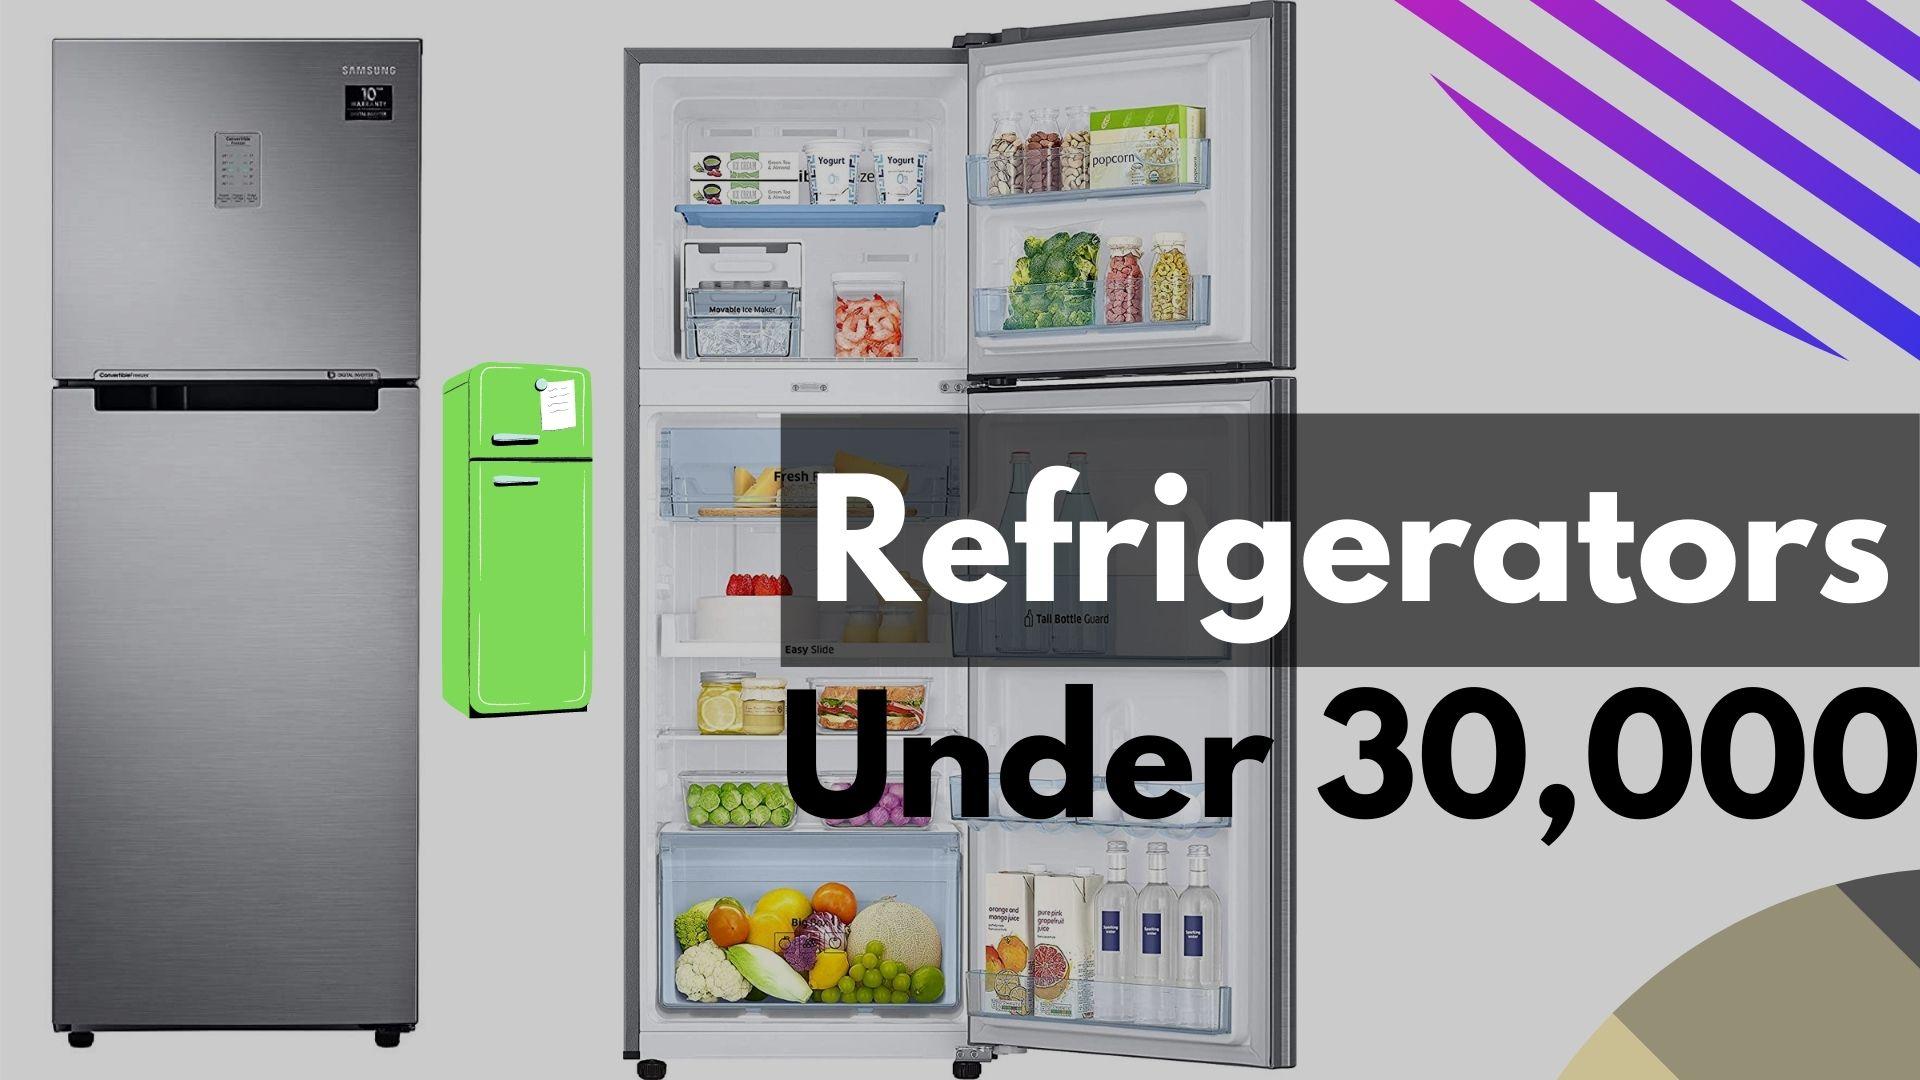 Refrigerators Under 30,000